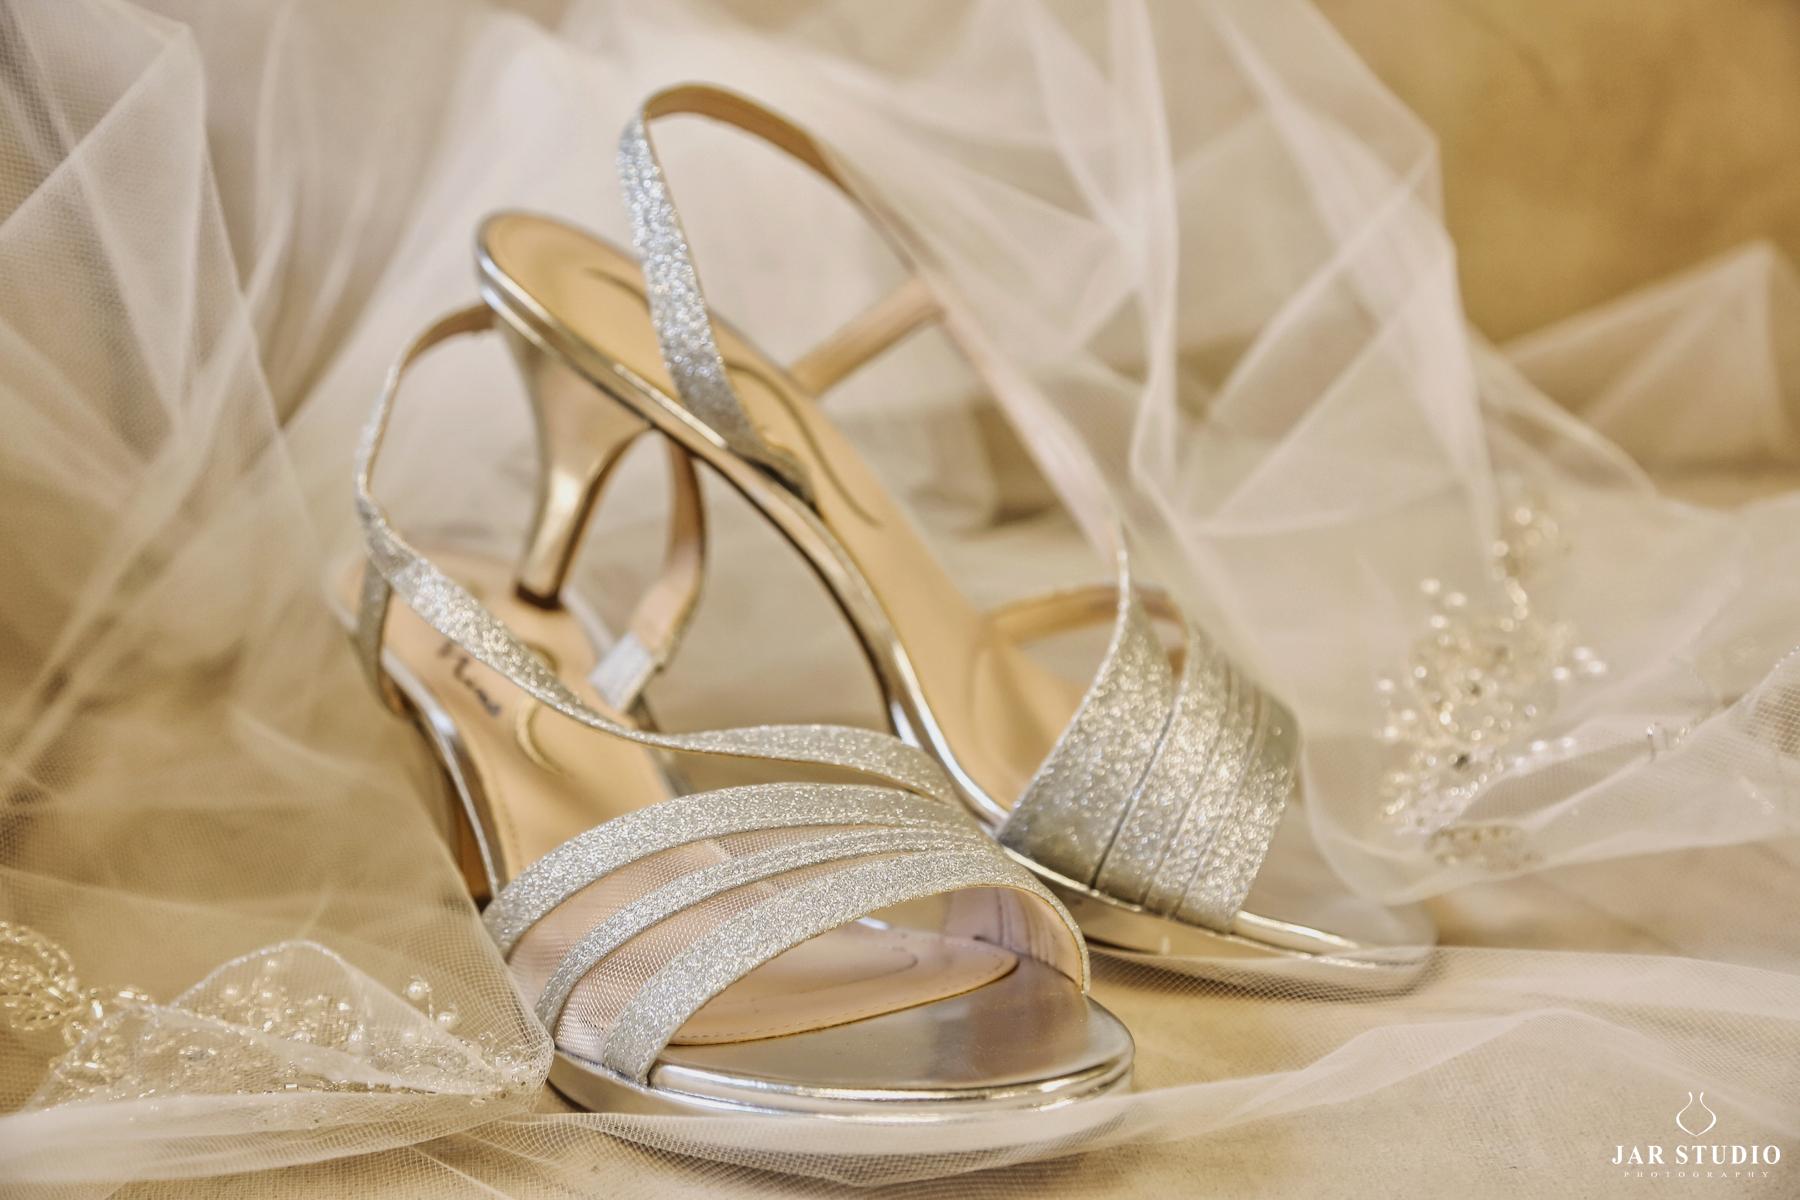 02-silver-shoes-wedding-photography-jarstudio.jpg